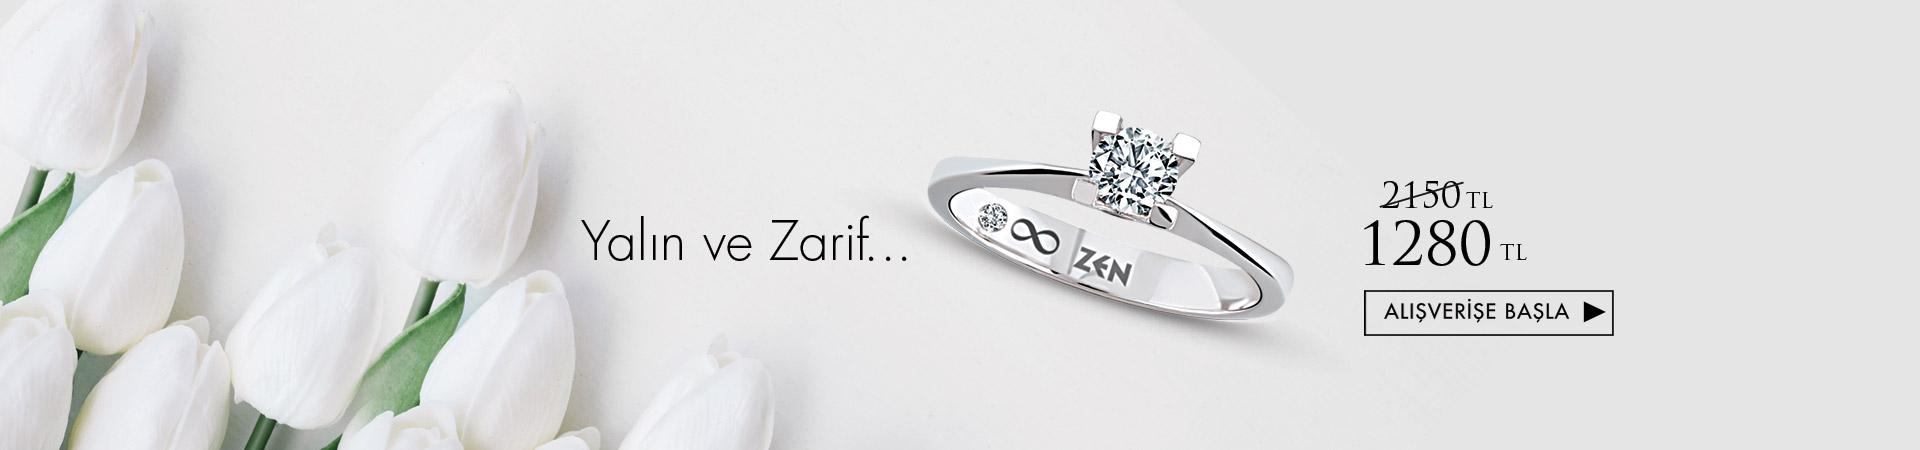 Yalın ve Zarif 1280 TL